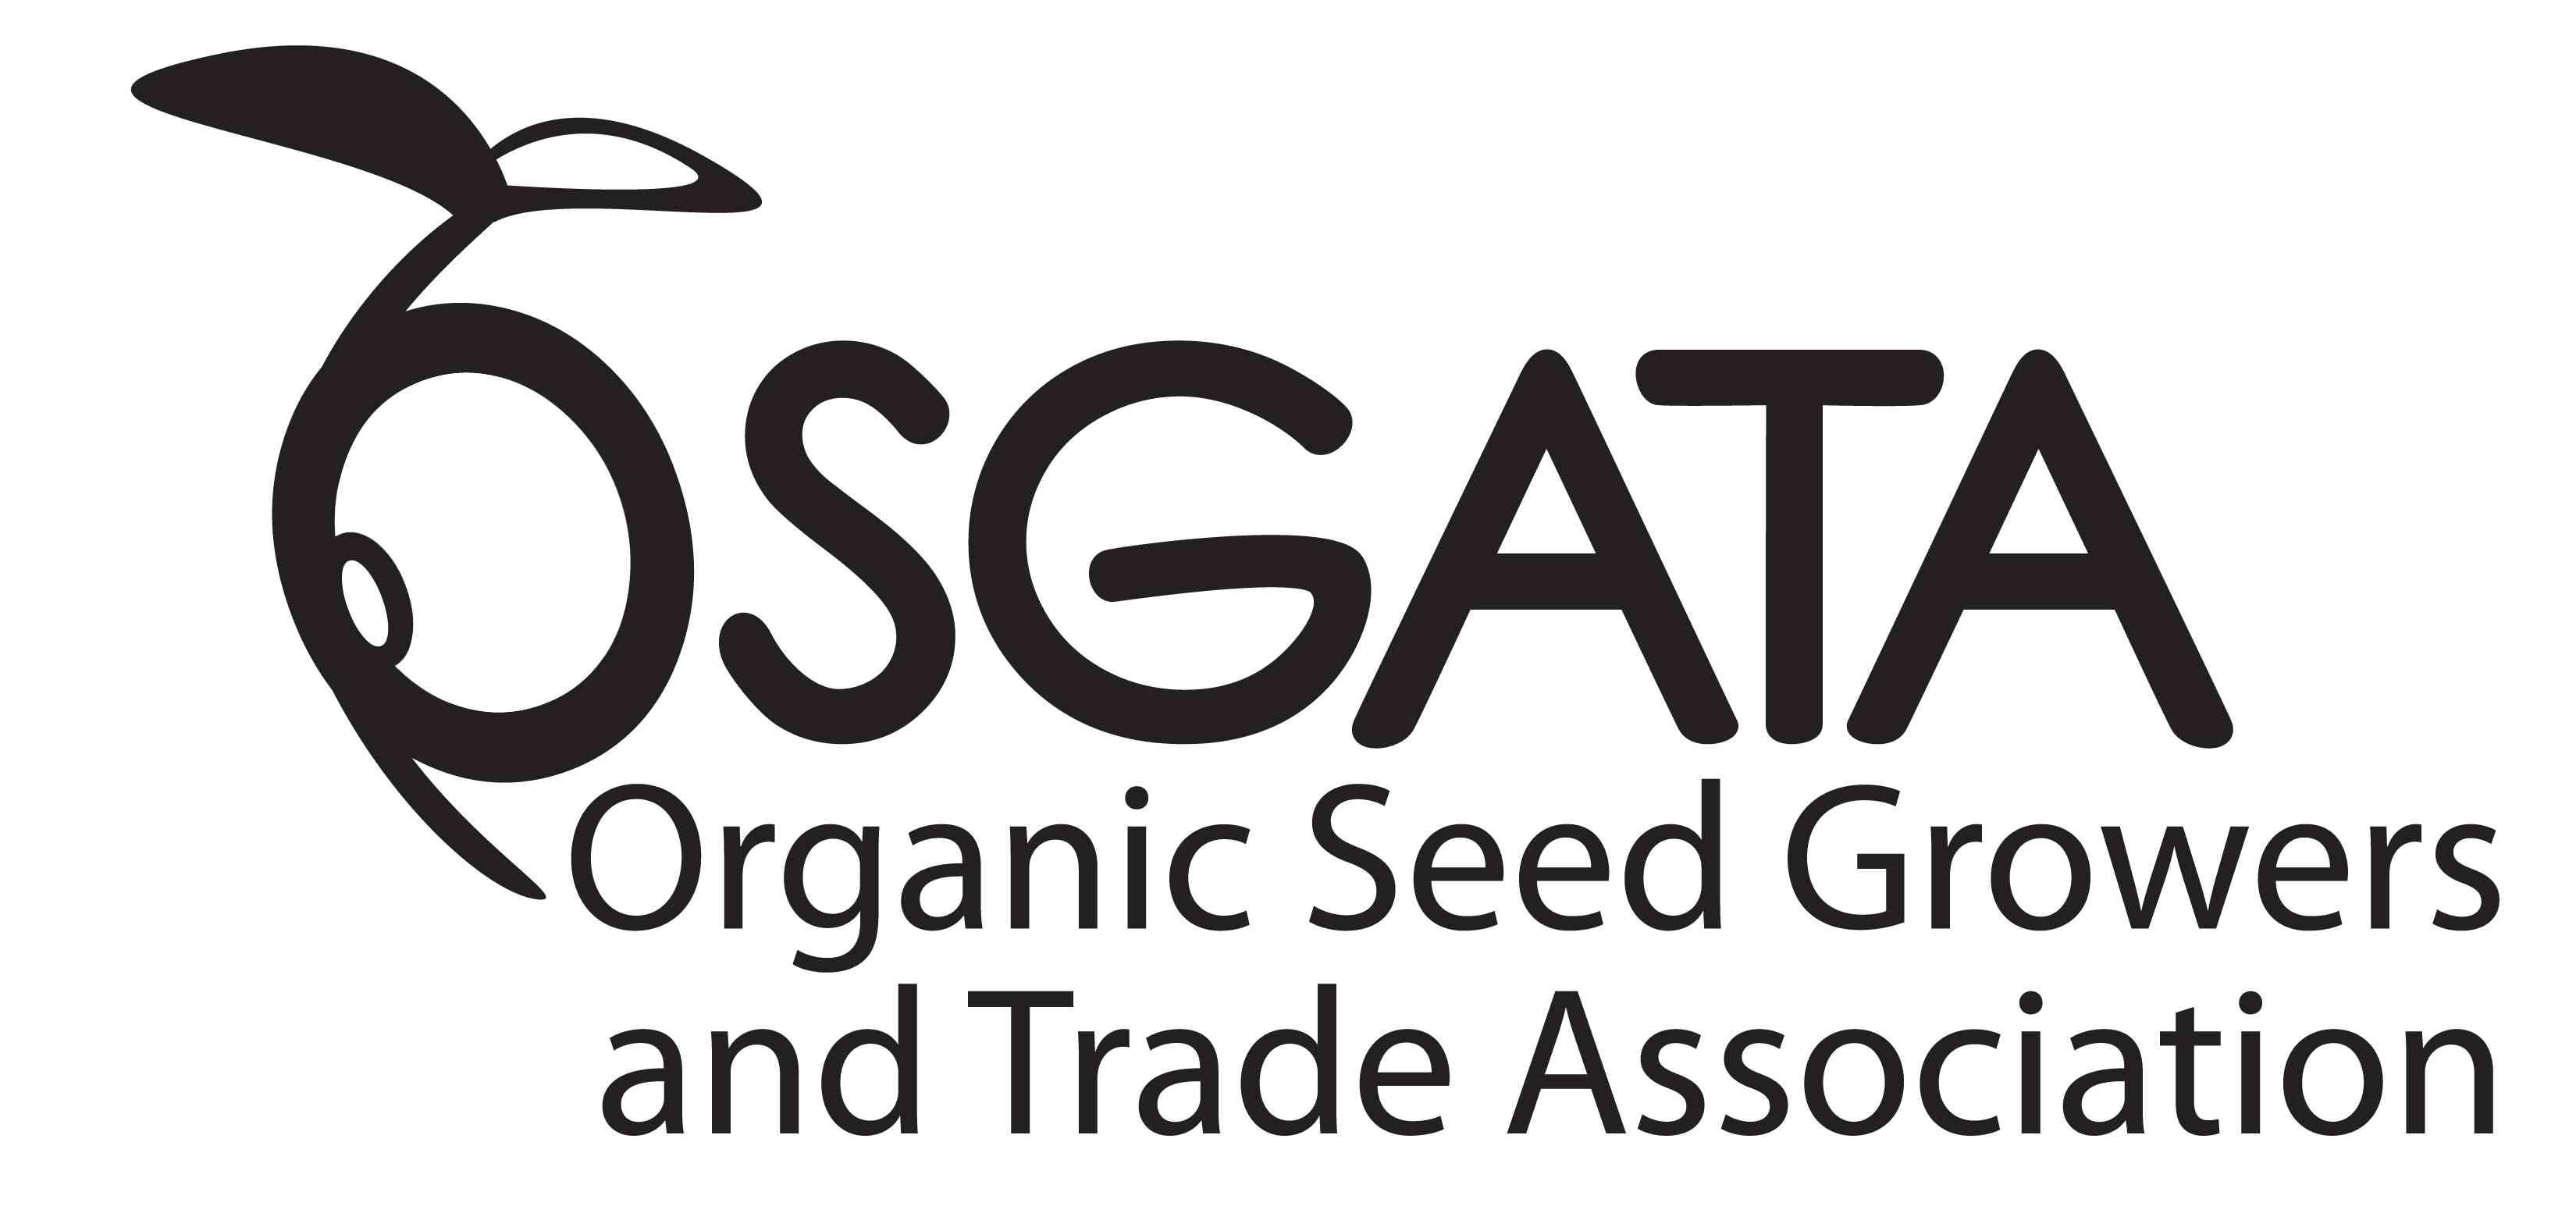 OSGATA logo